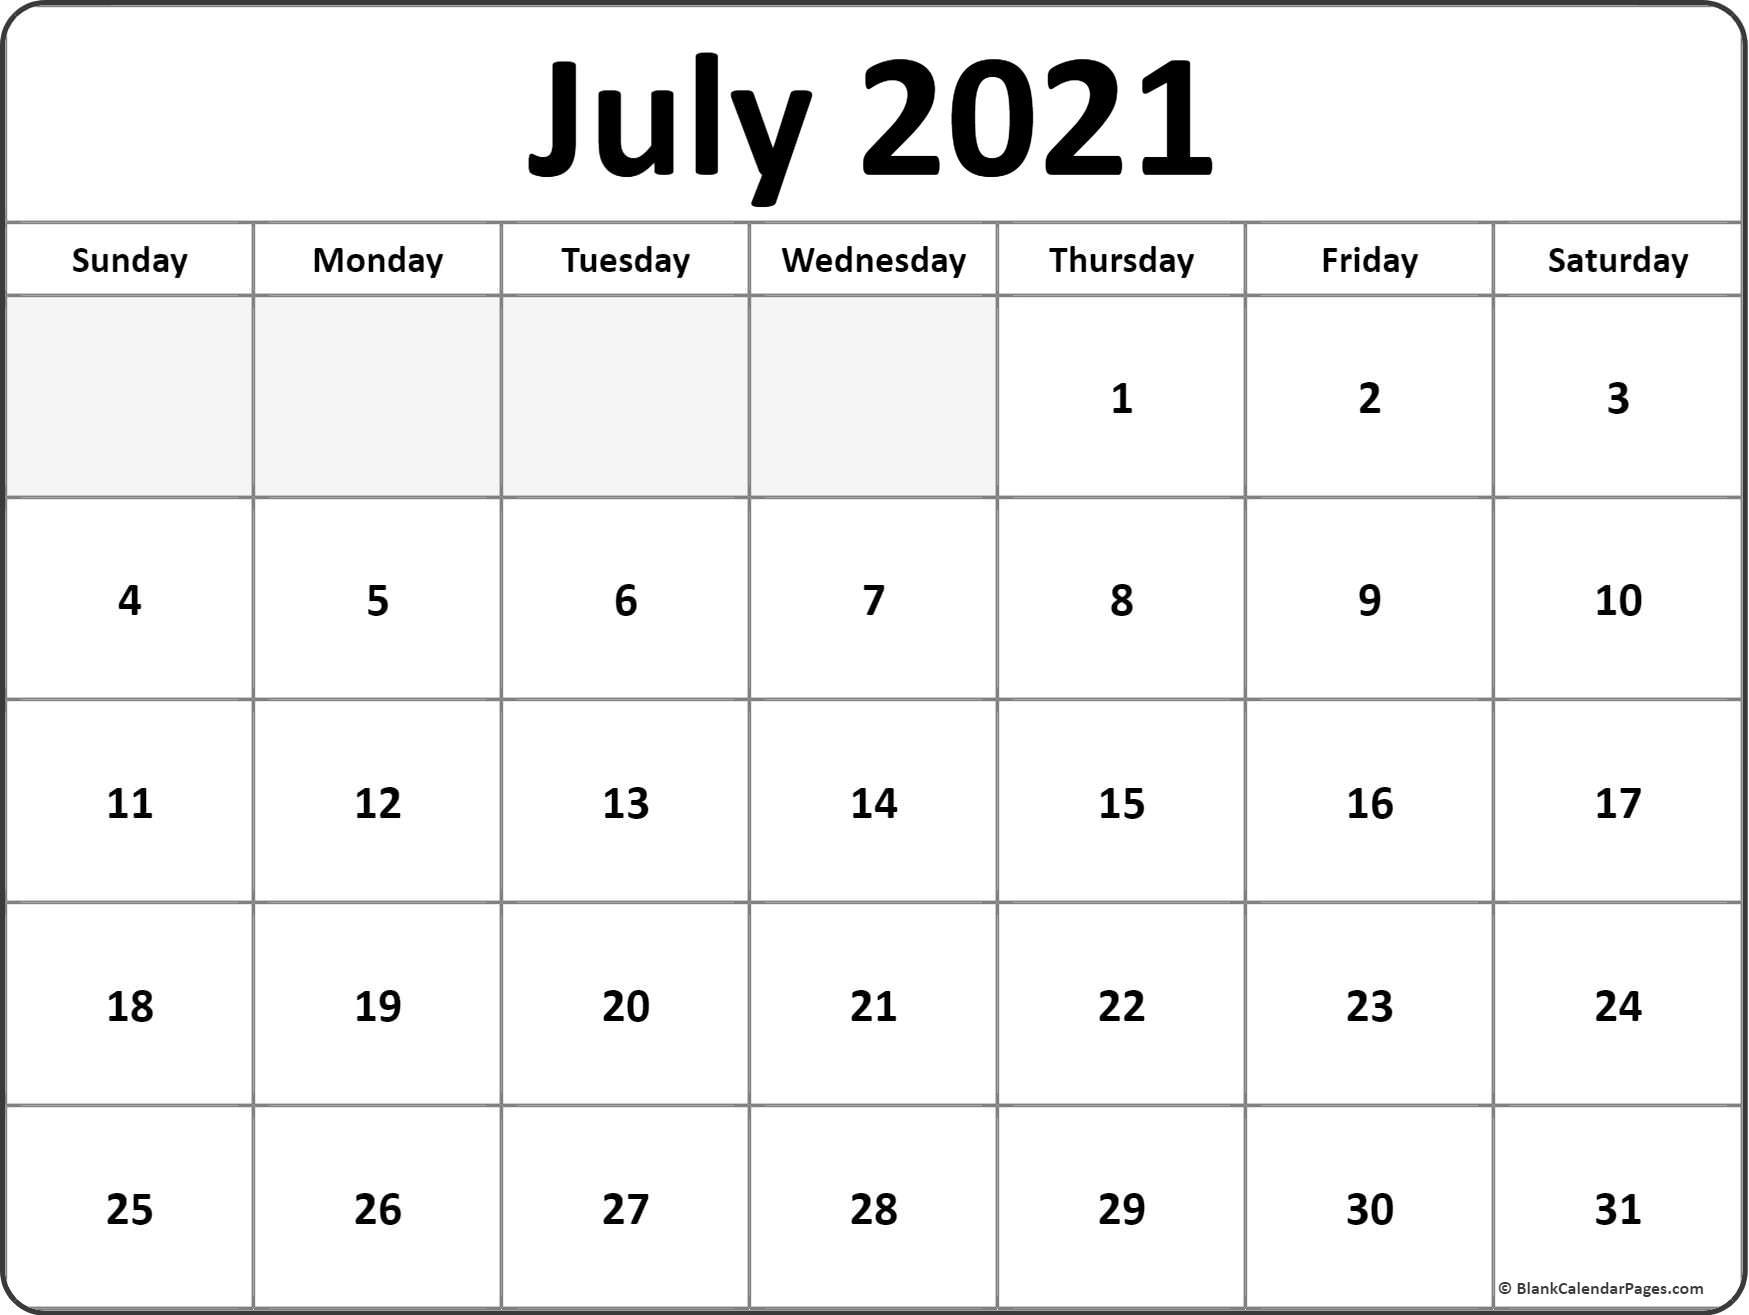 July 2021 Calendar | Free Printable Calendar Templates